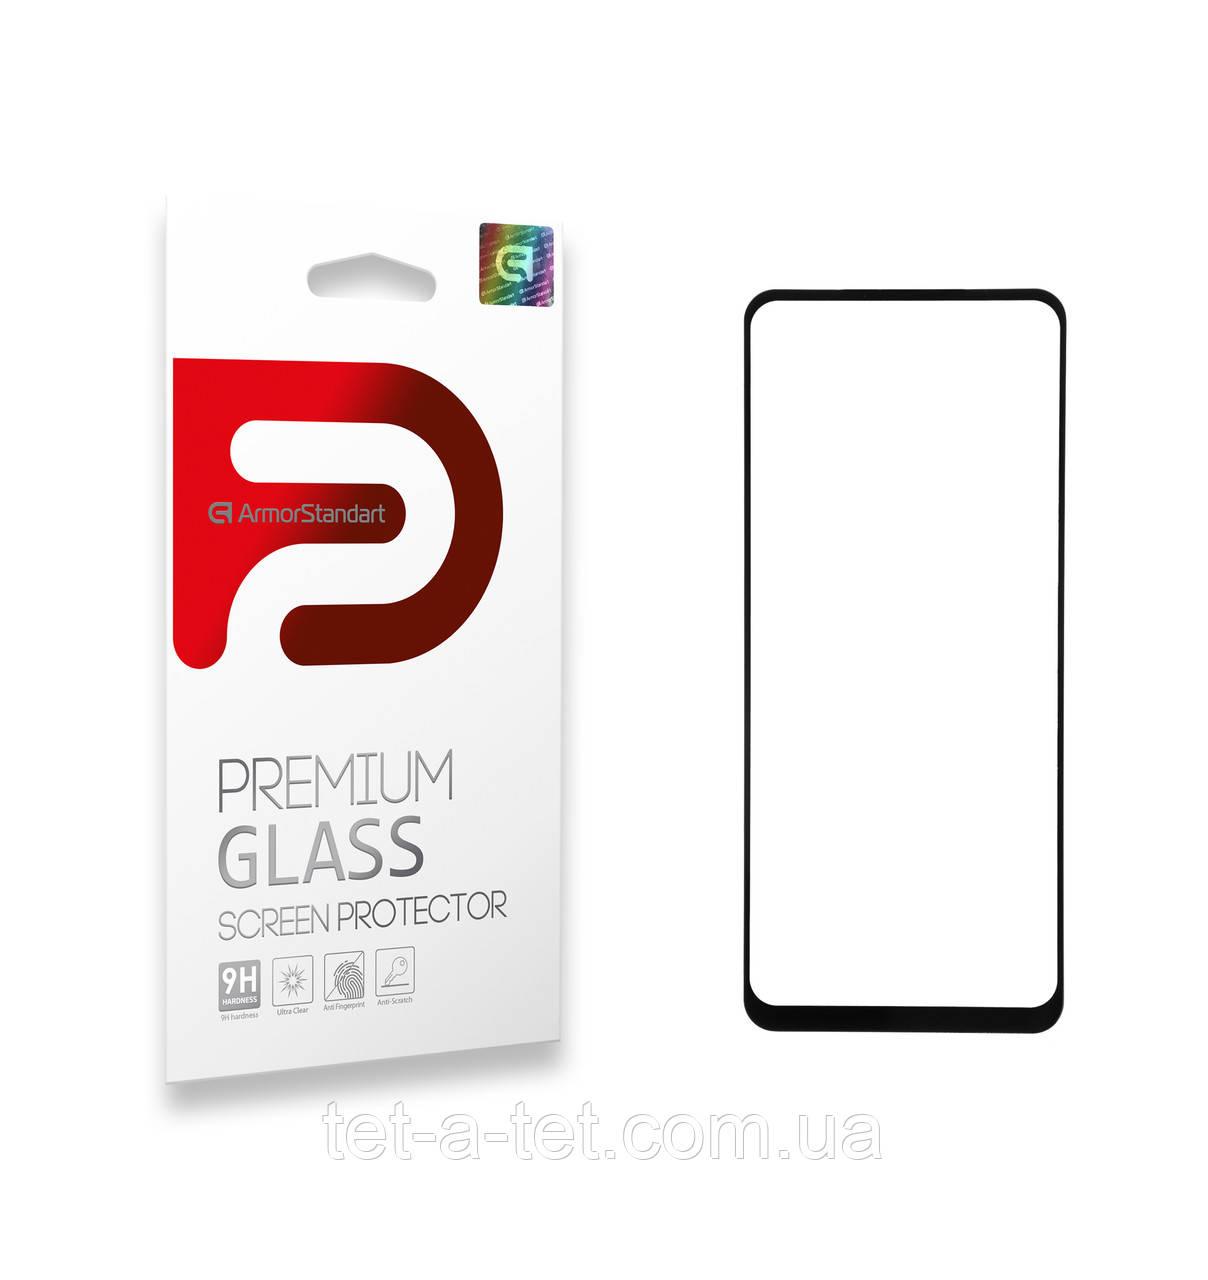 Защитное стекло Armorstandart Full Glue для TECNO Spark 6 (KE7) Black (premium glass)